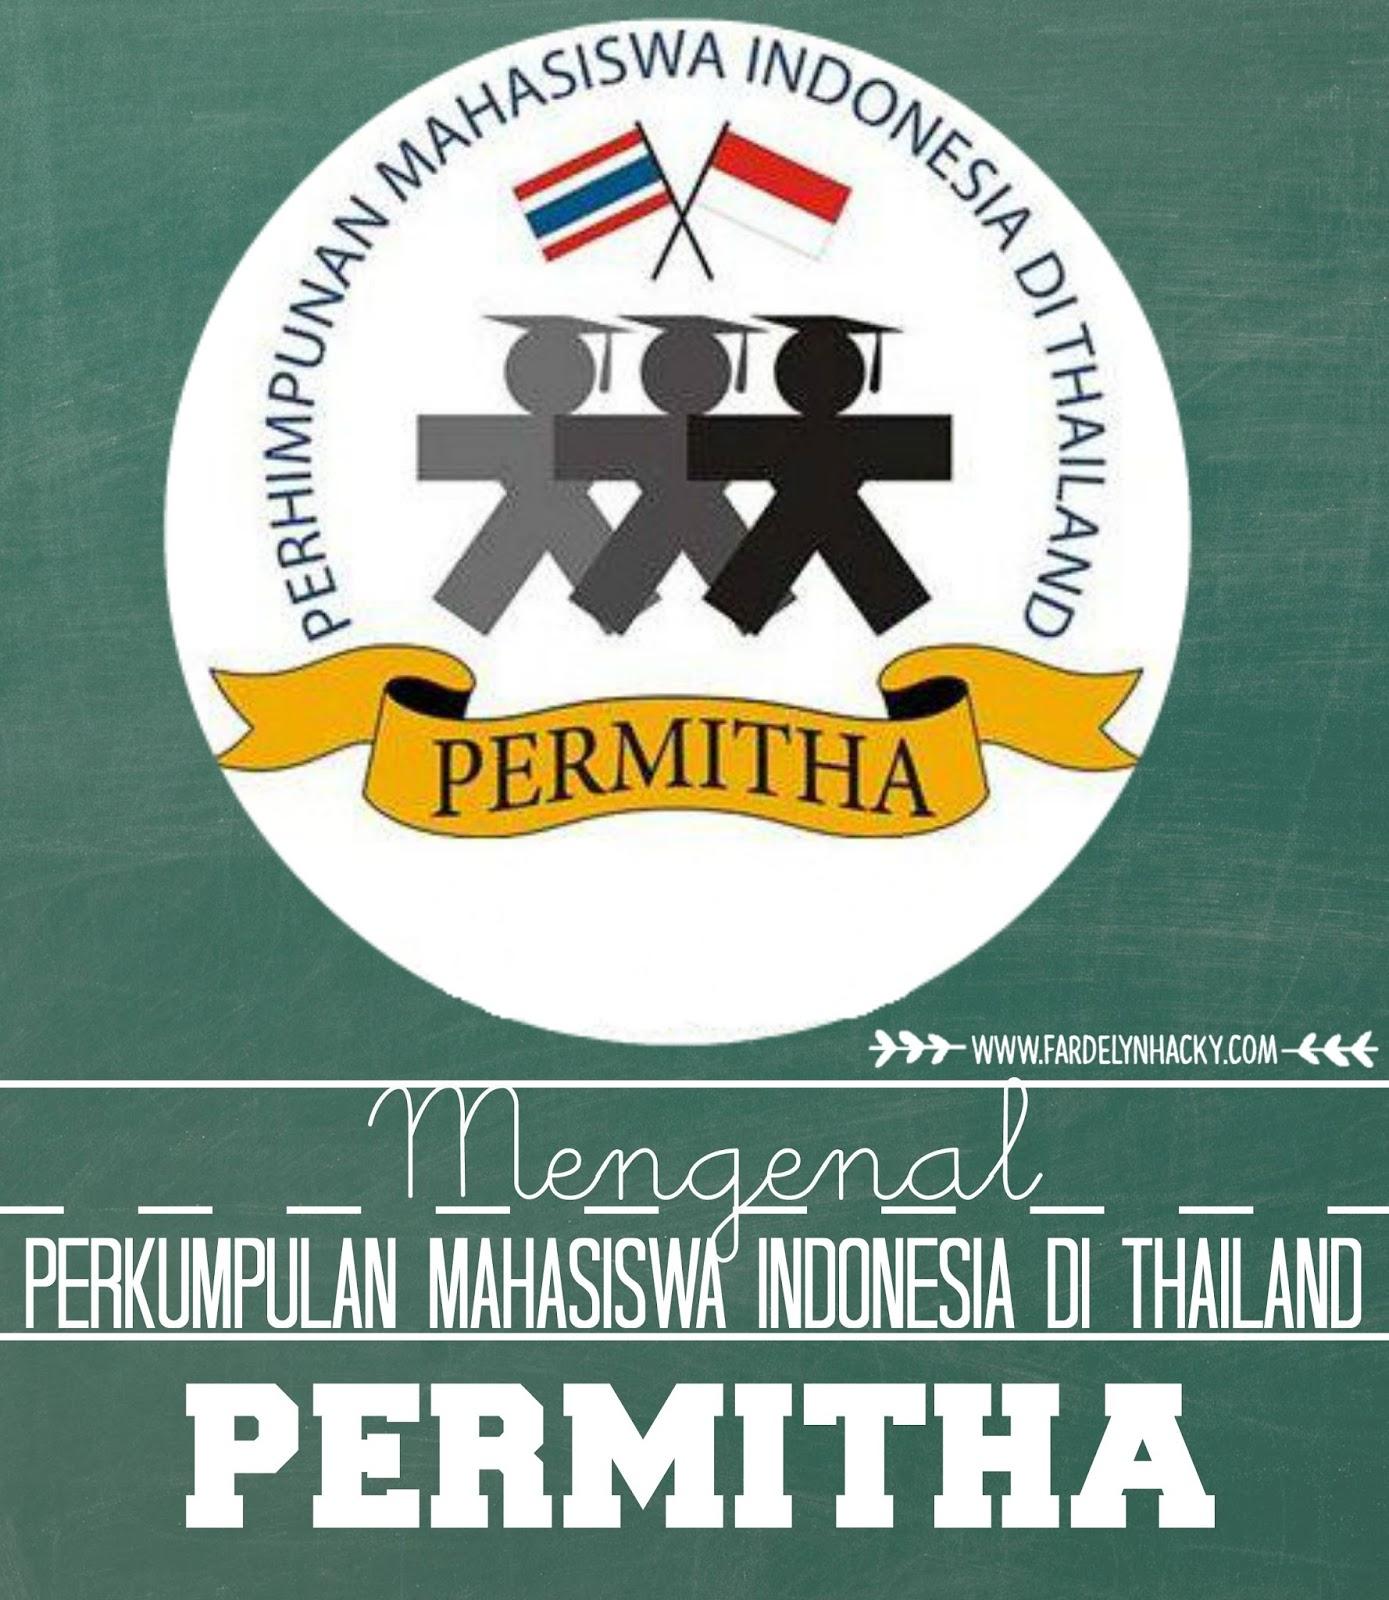 PERMITHA, Permitha, Permitha PSU, Perkumpulan Mahasiswa Indonesia di Thailand